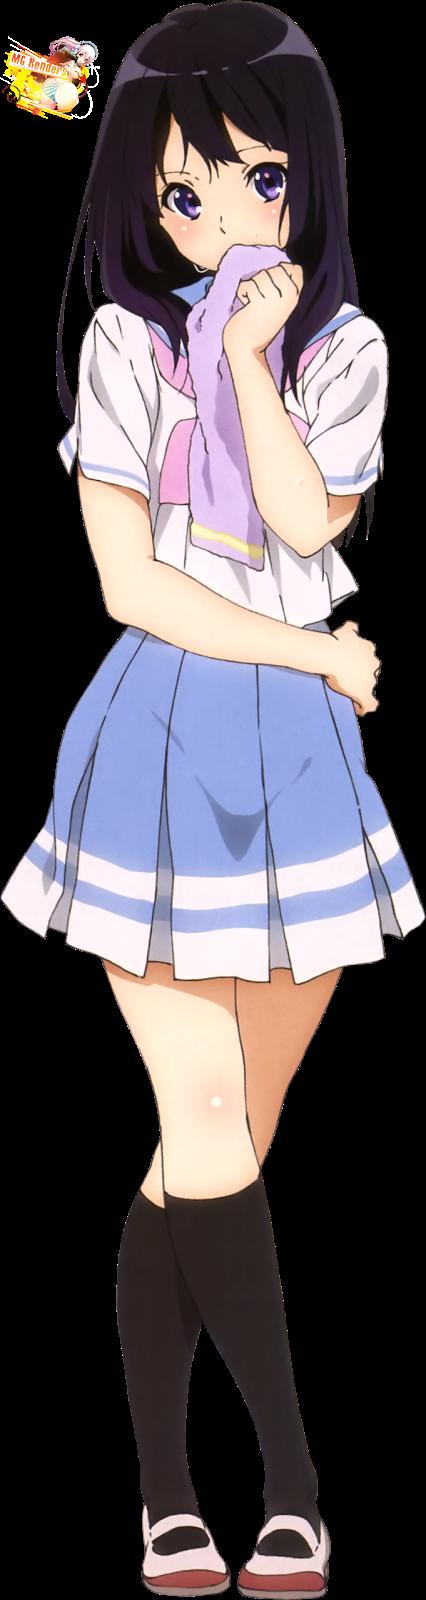 Tags: Anime, Render,  Hibike! Euphonium,  Kousaka Reina,  Skirt, PNG, Image, Picture